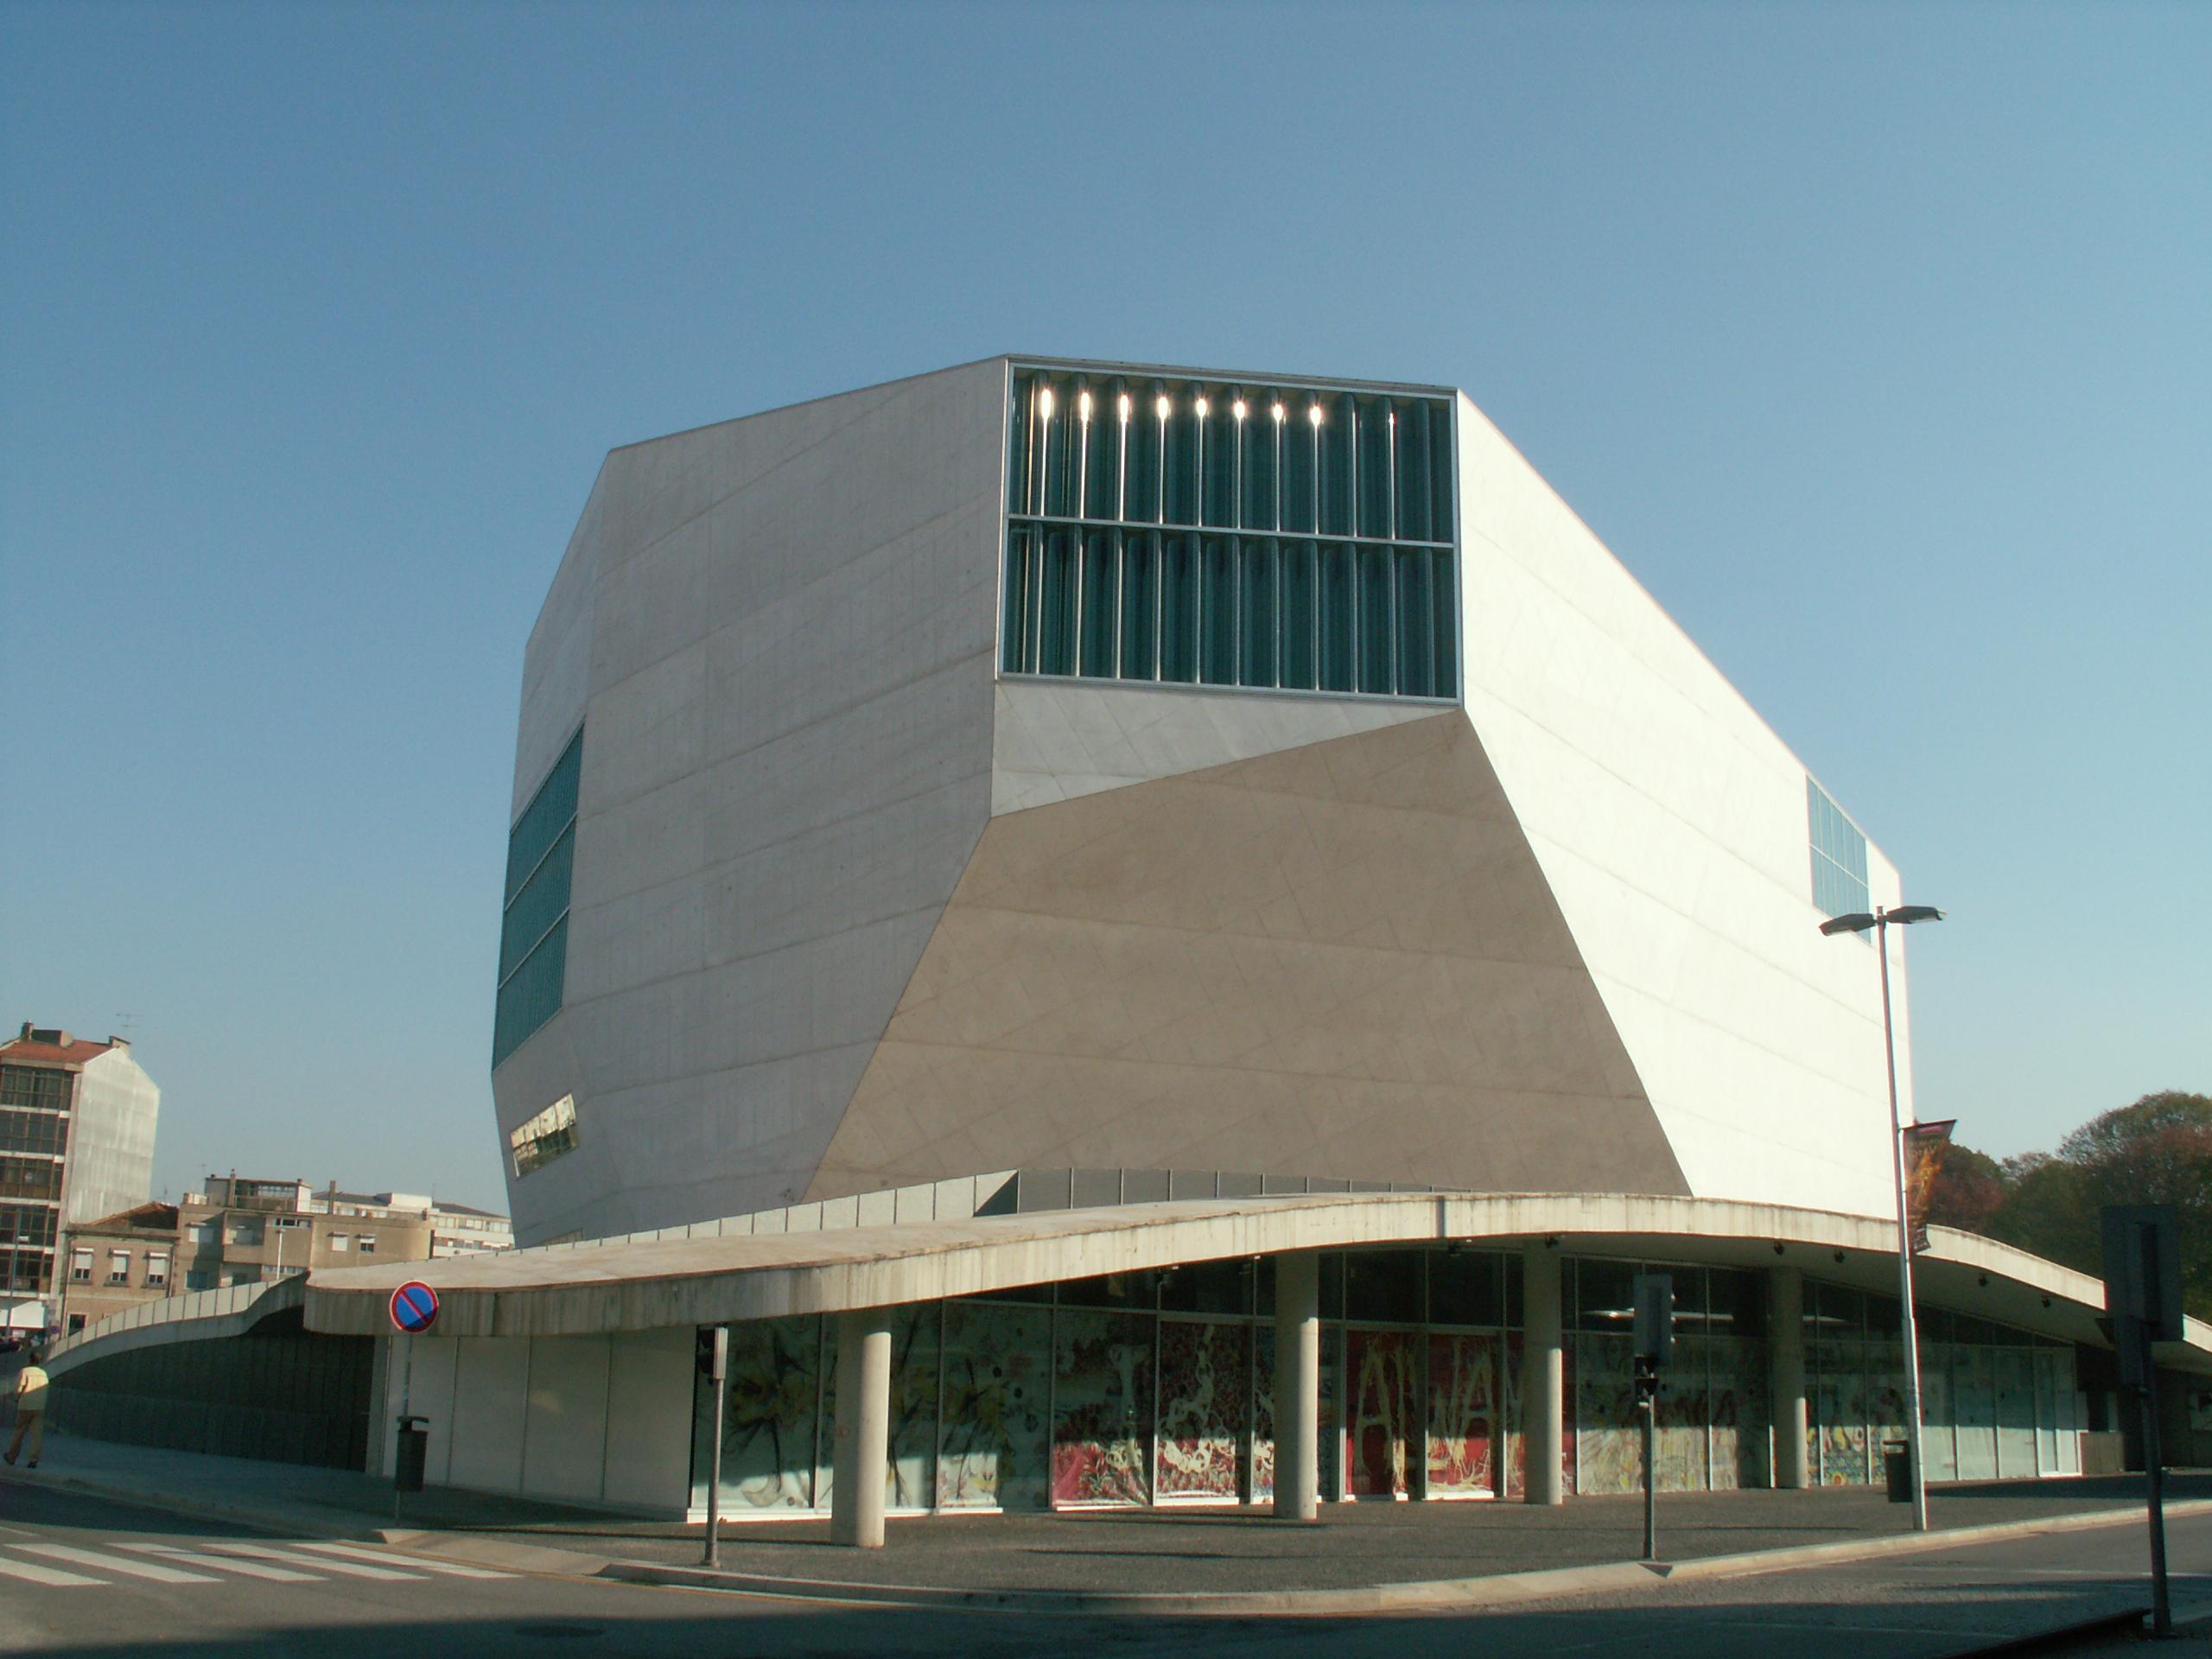 Vodafone headquarters by barbosa guimaraes dezeen for Cassa musica